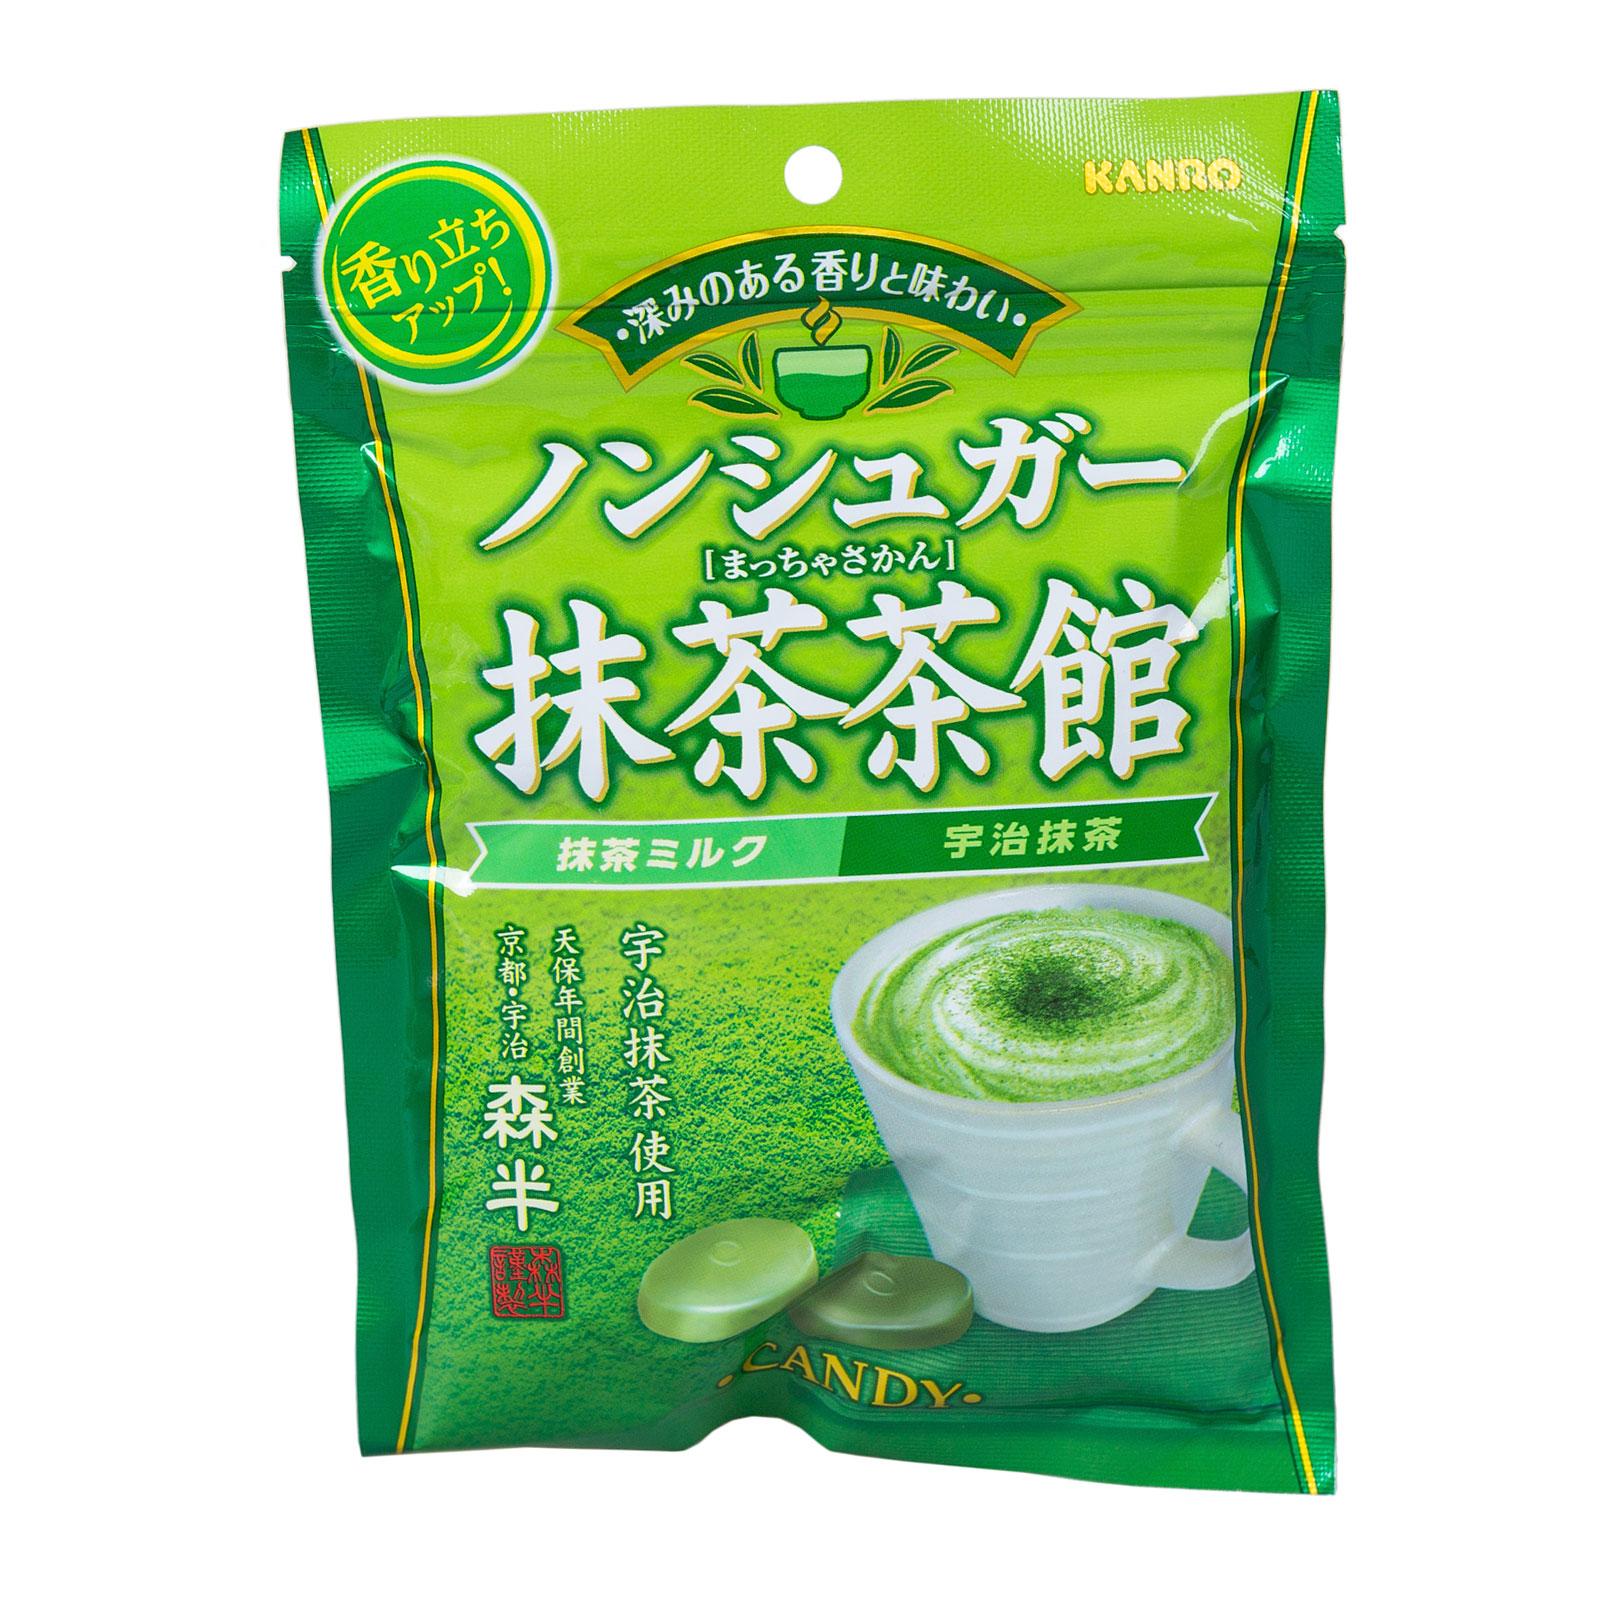 Конфеты Canro Co с зеленым чаем Matcha Леденцы без сахара 110 гр<br>